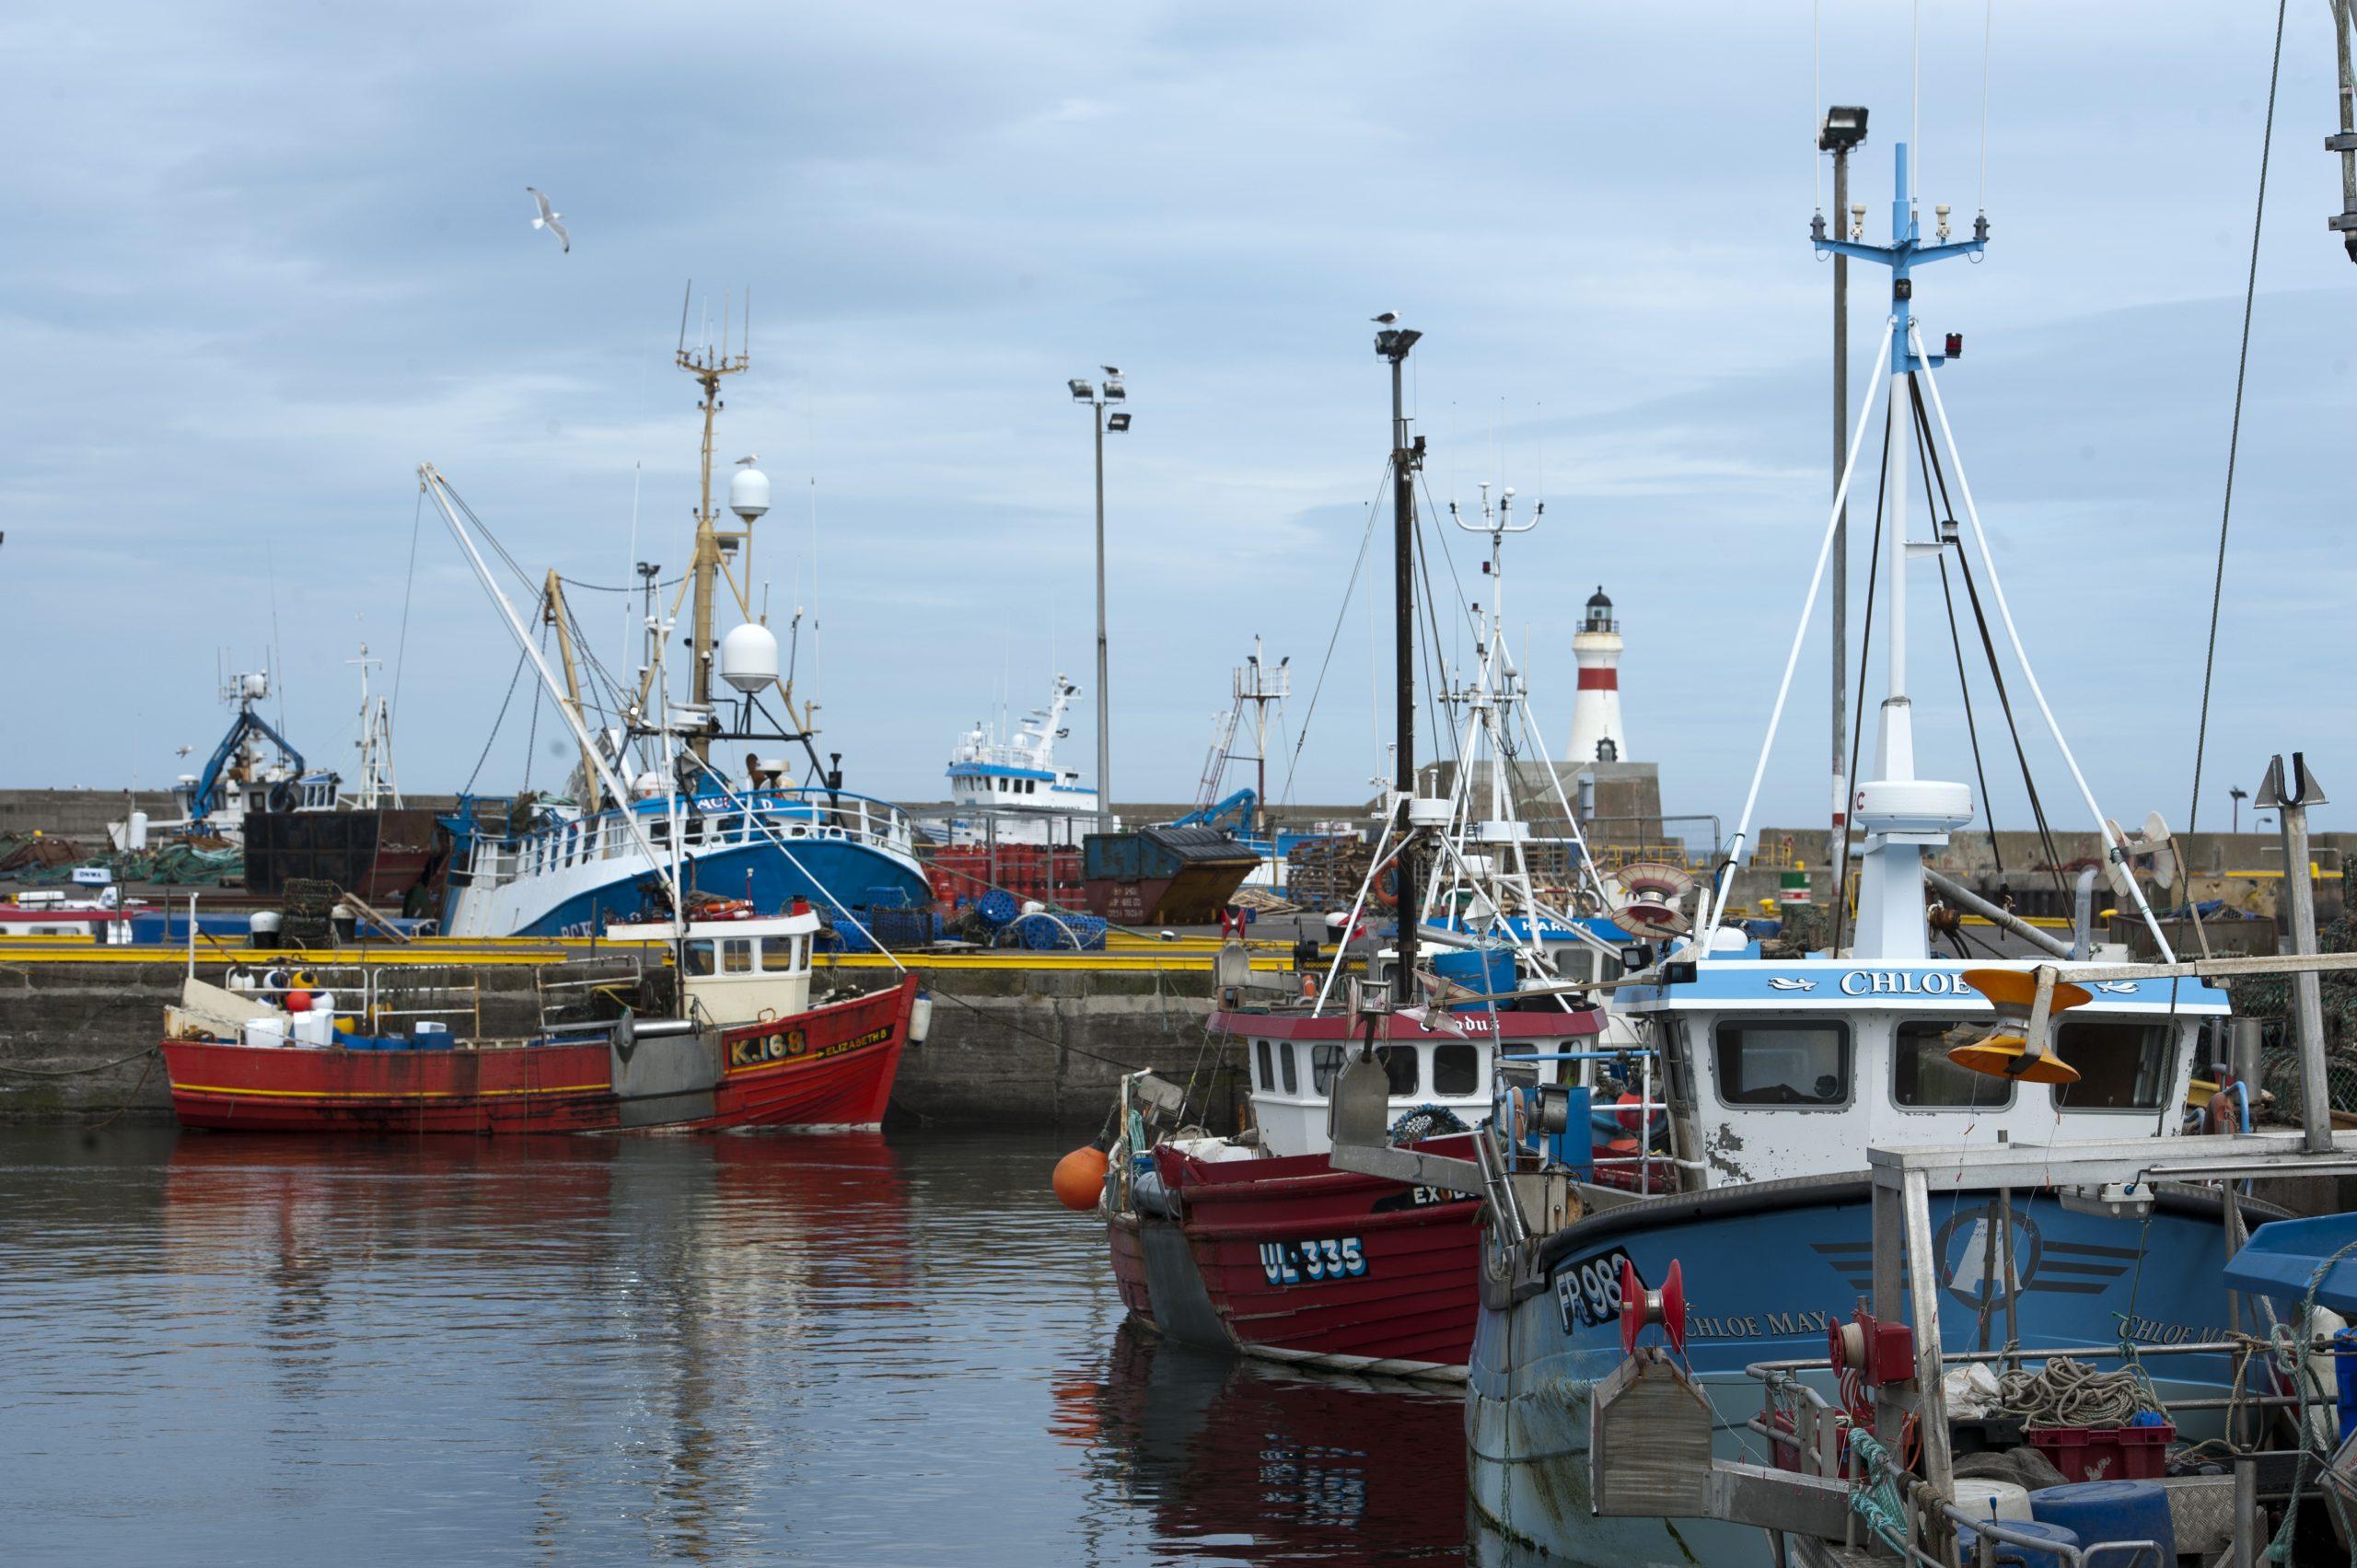 First Seafish economic performance estimates for 2020 show negative impact of the COVID19 pandemic on the UK fishing fleet